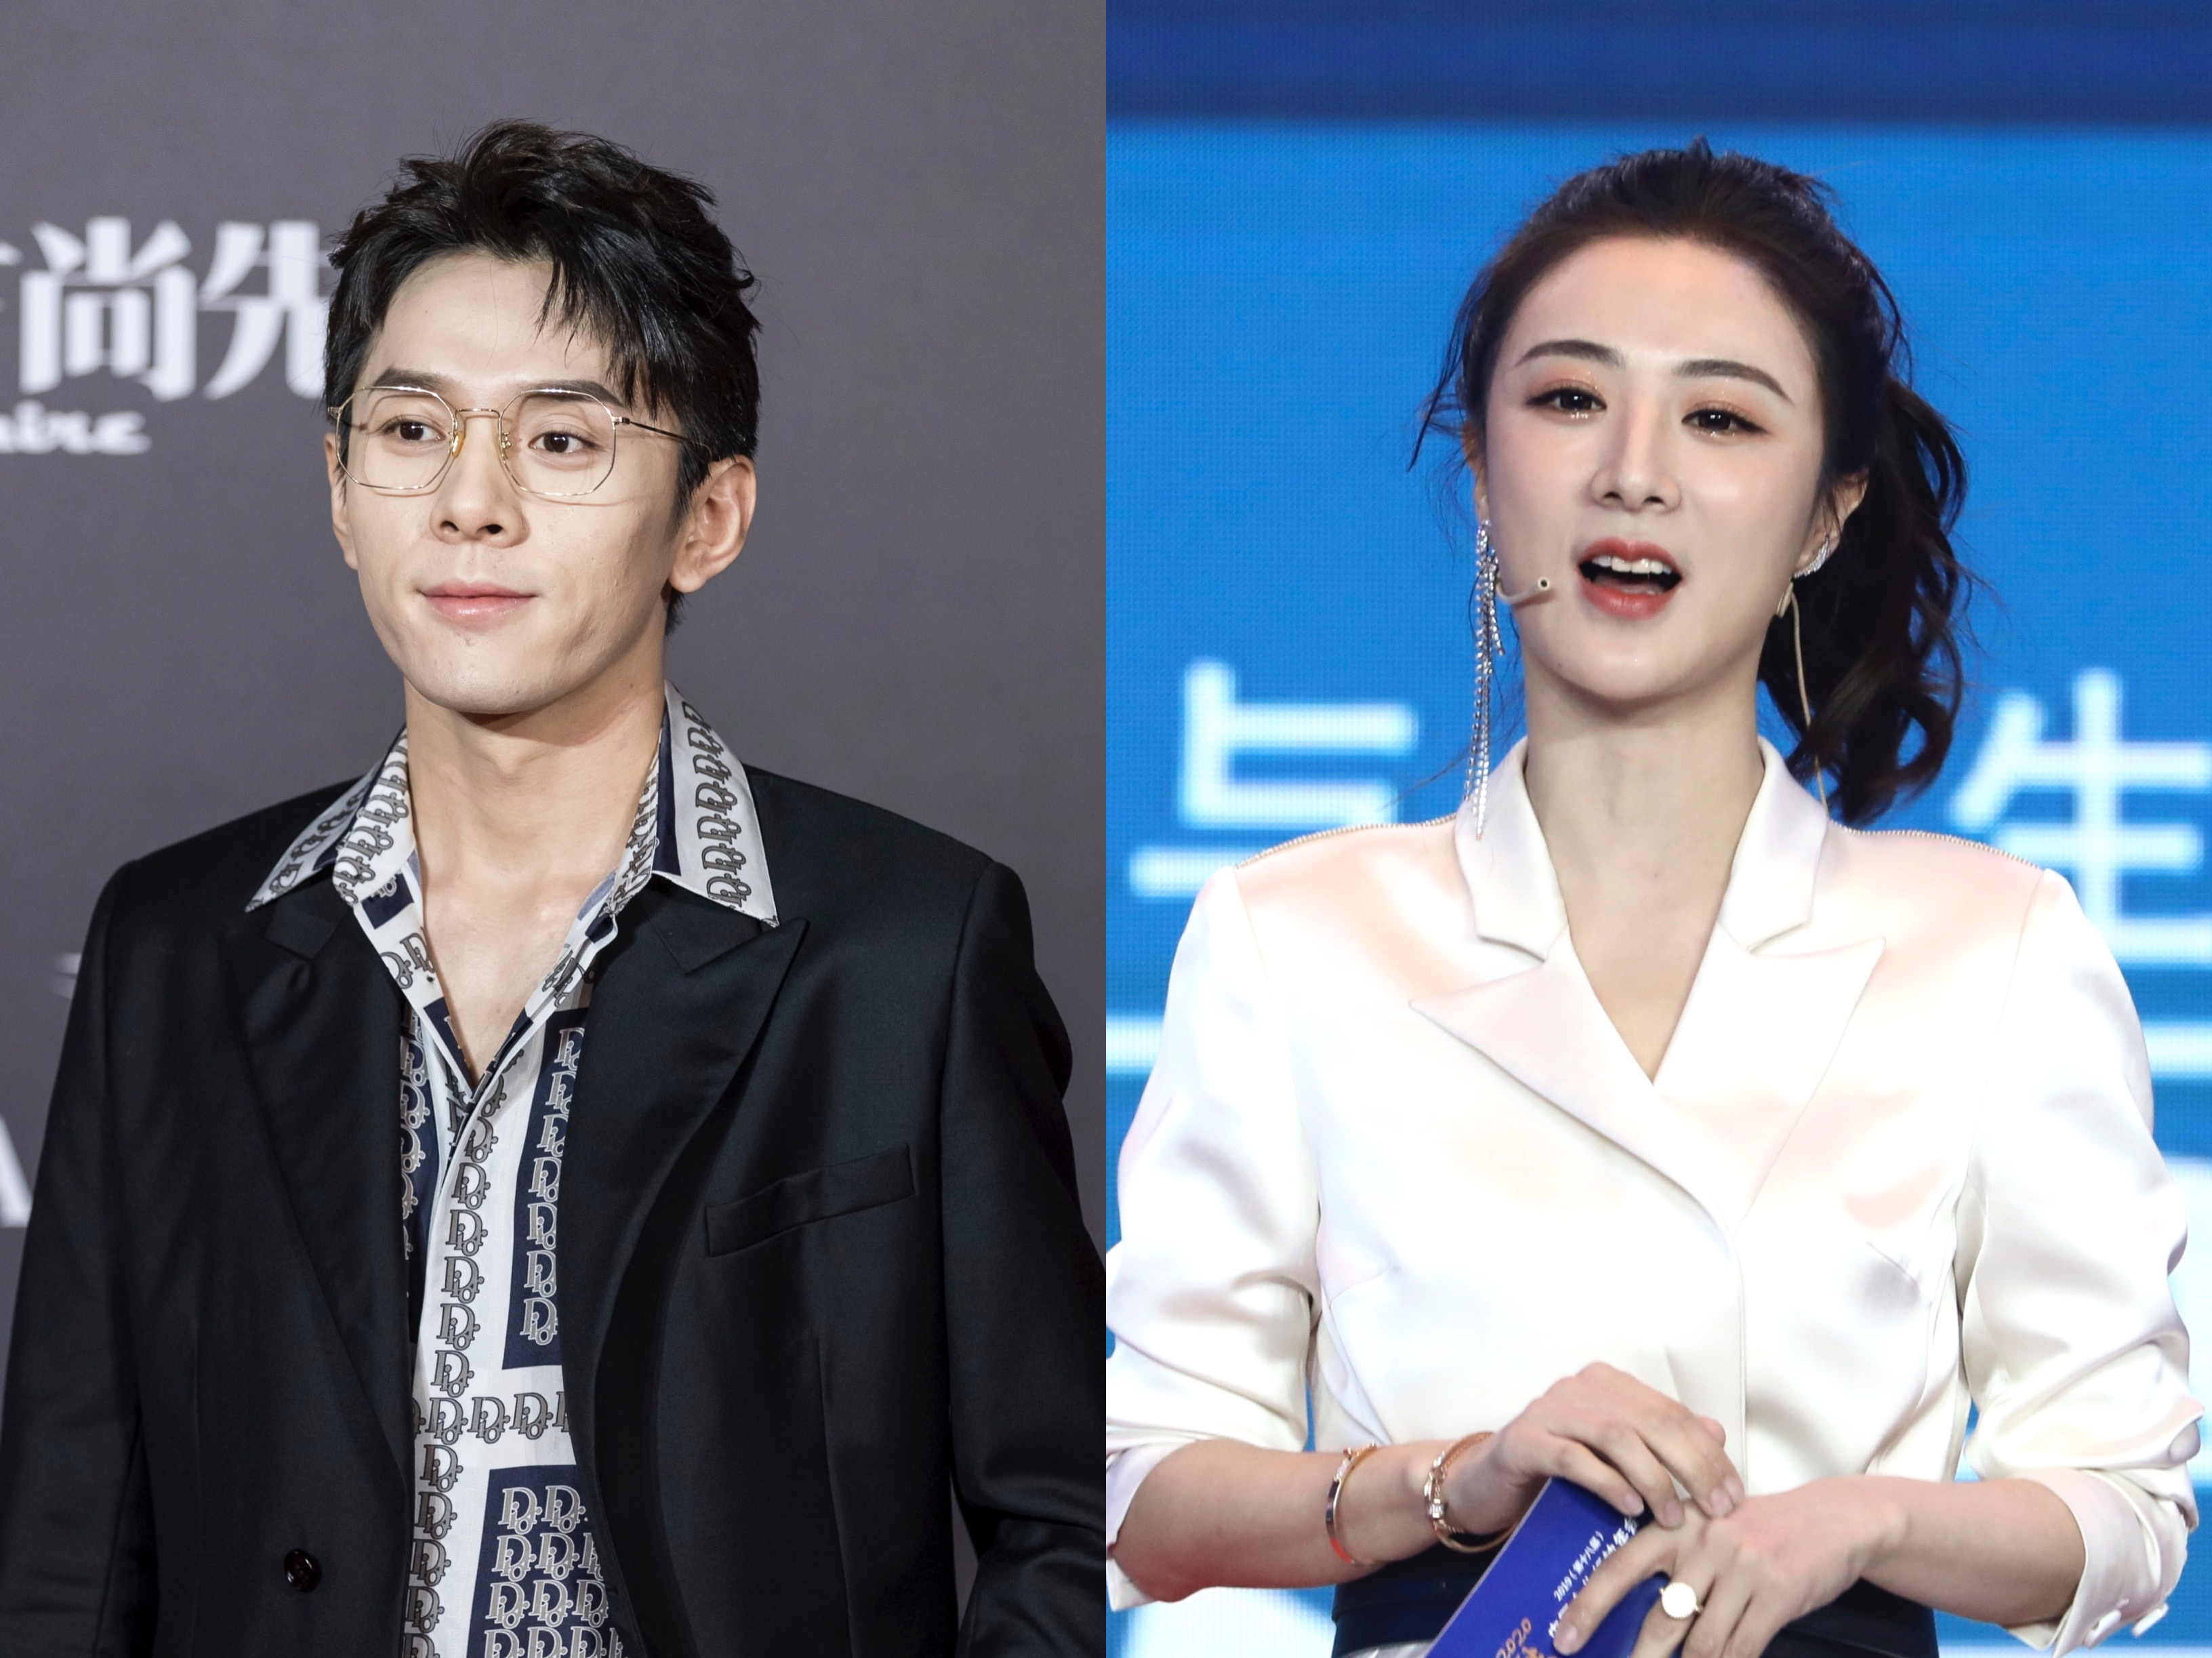 China's top livestreamer Austin Li and Viya